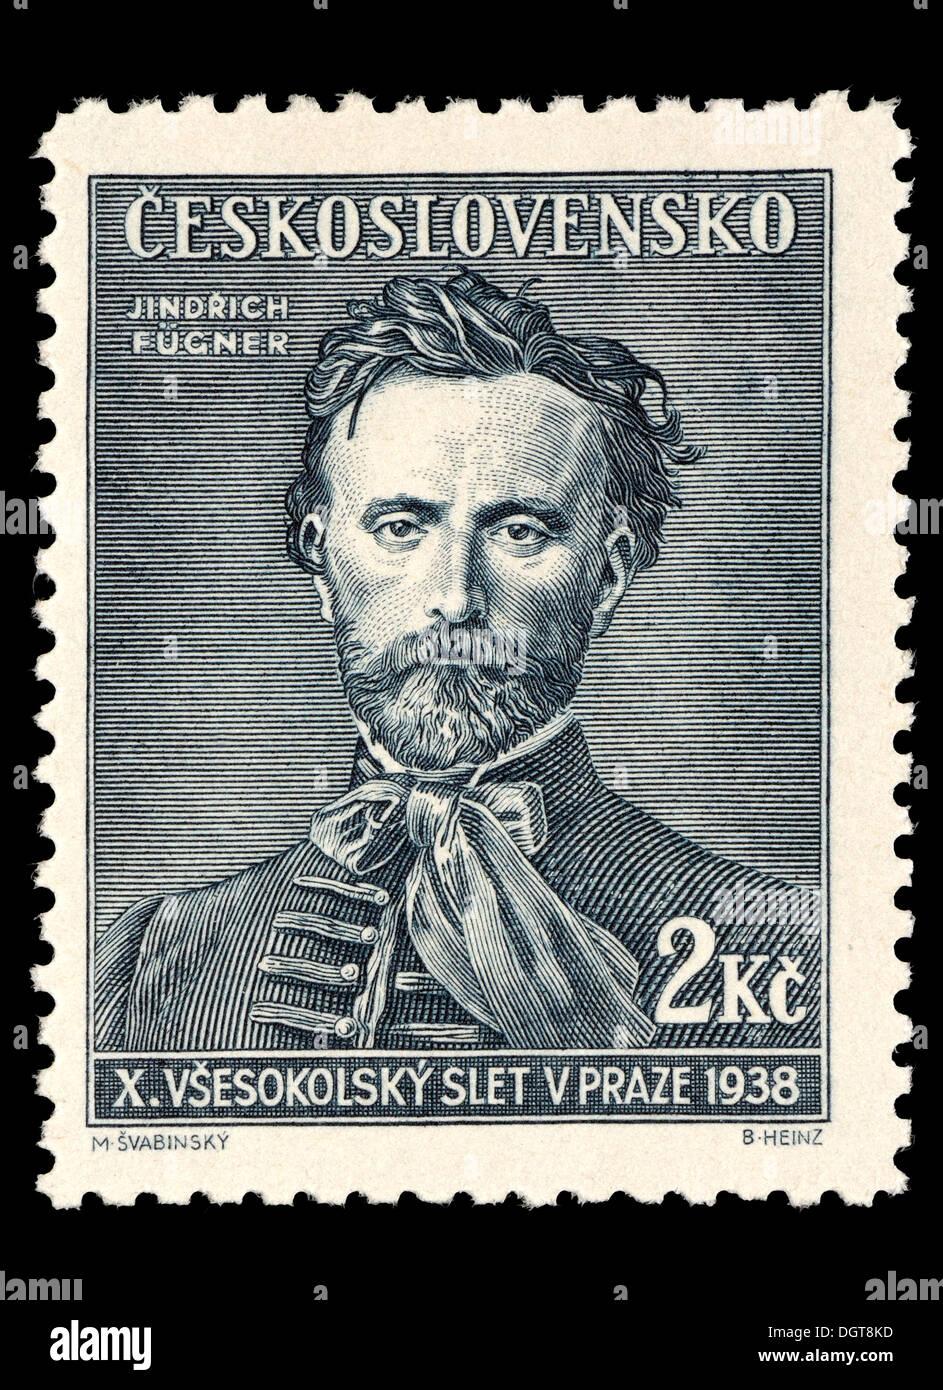 Timbre-poste de la Tchécoslovaquie - Jindrich Fugner (1822-65) 8a1d37ea987